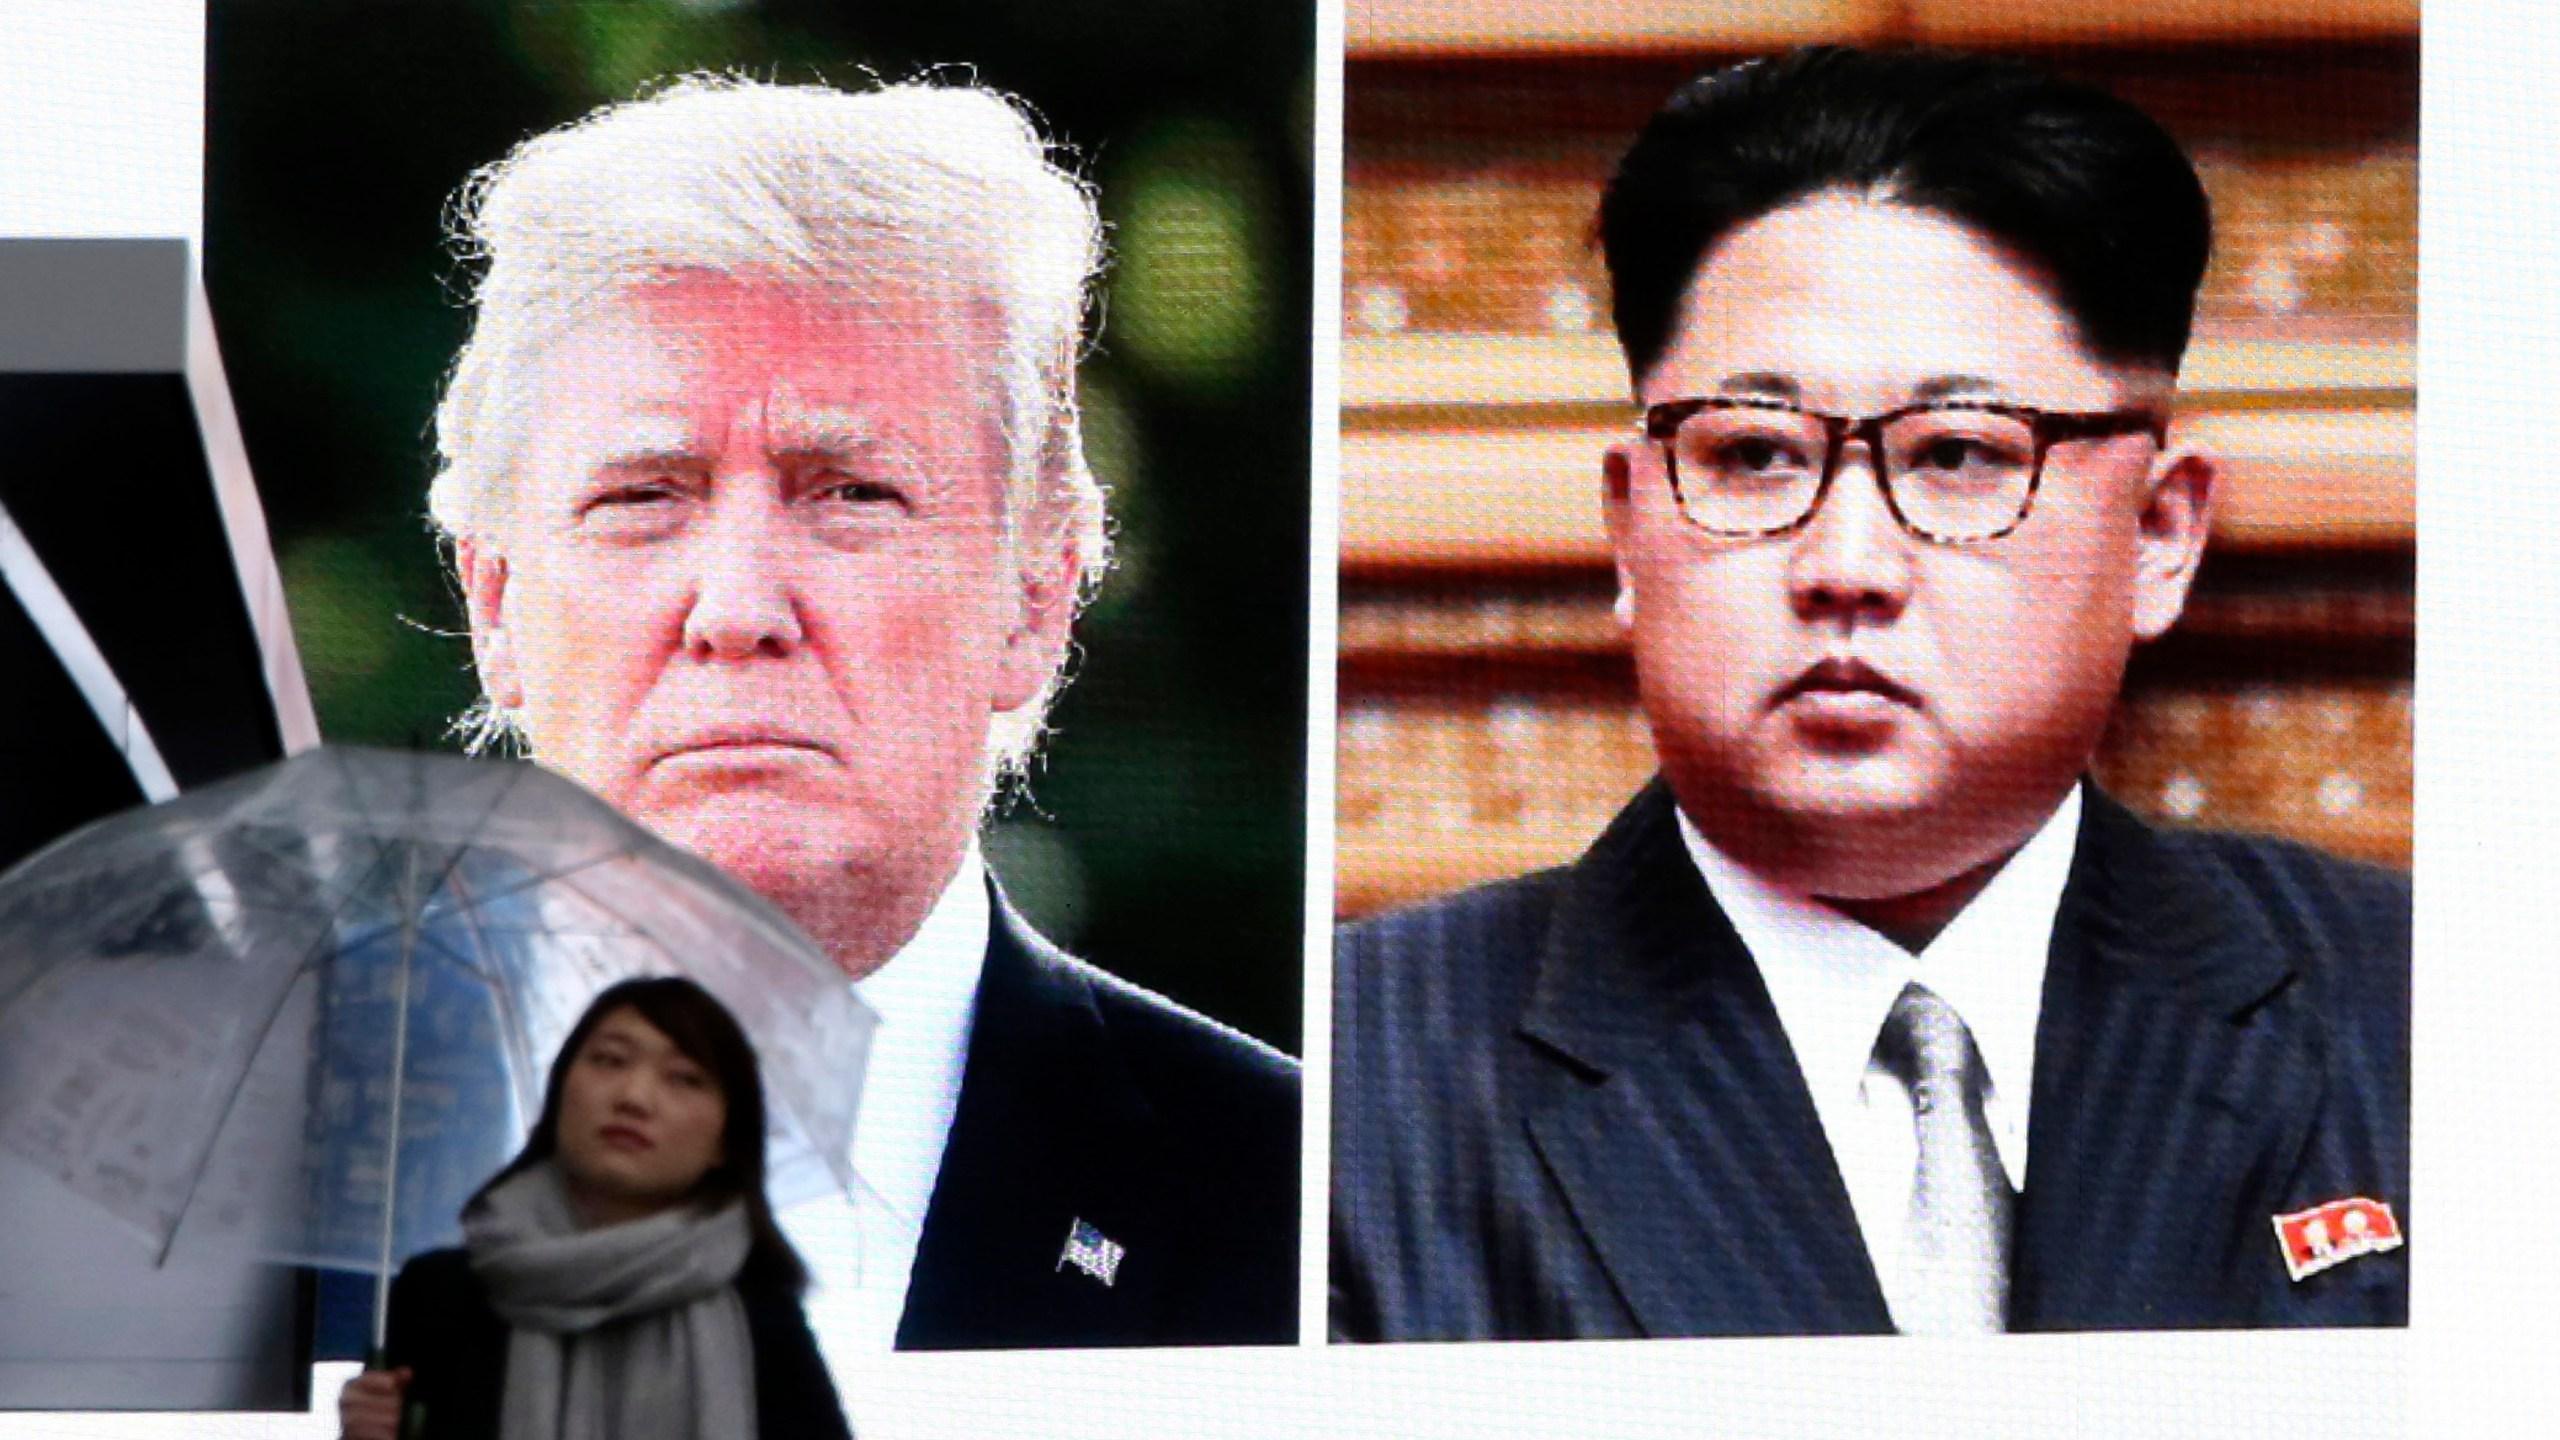 United_States_North_Korea_What's_Ahead_49107-159532.jpg67234464